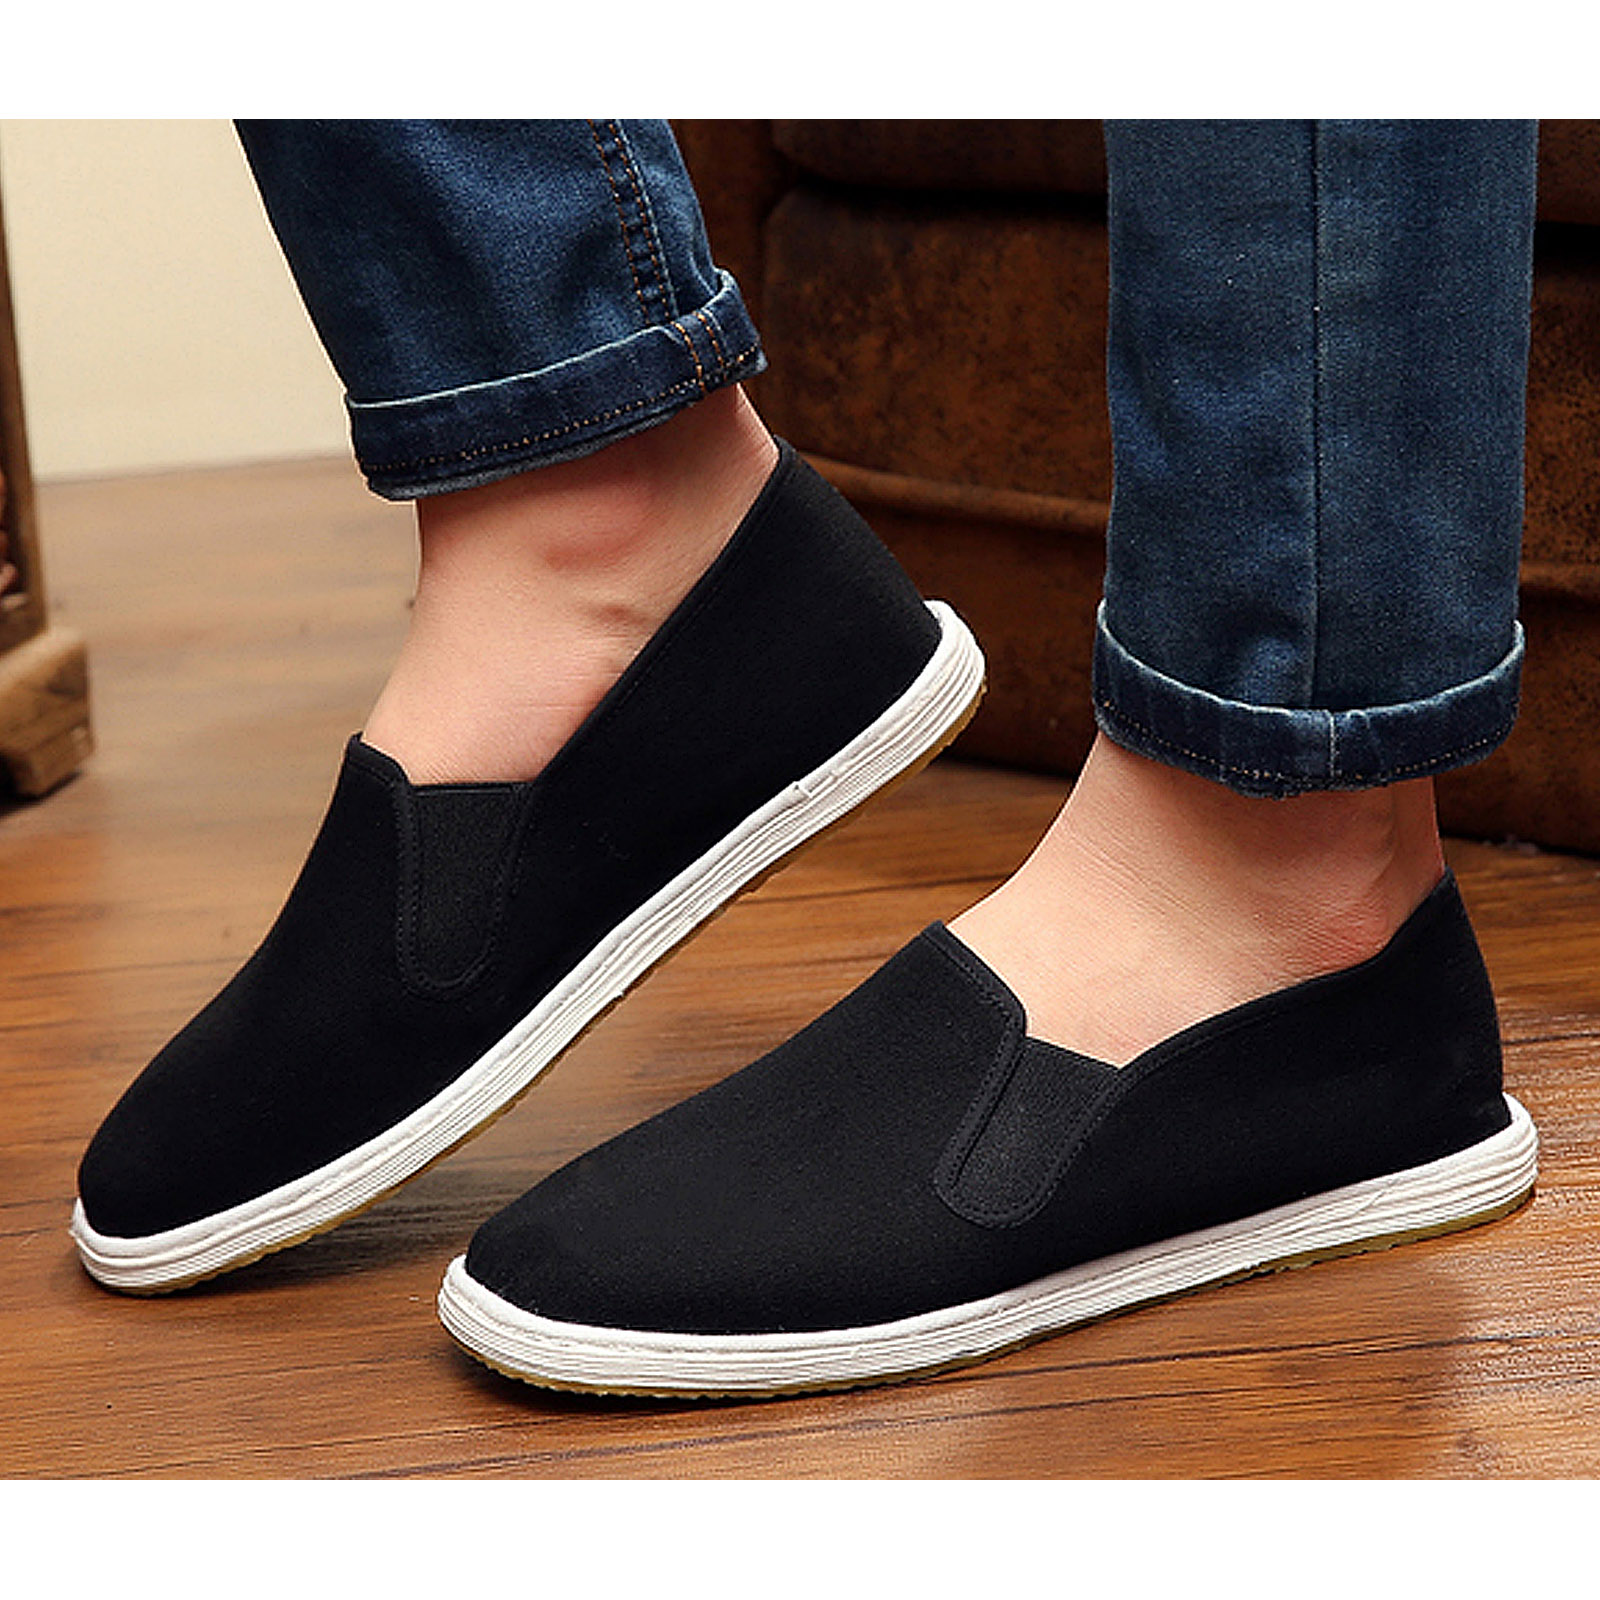 Plimsoll or slipper